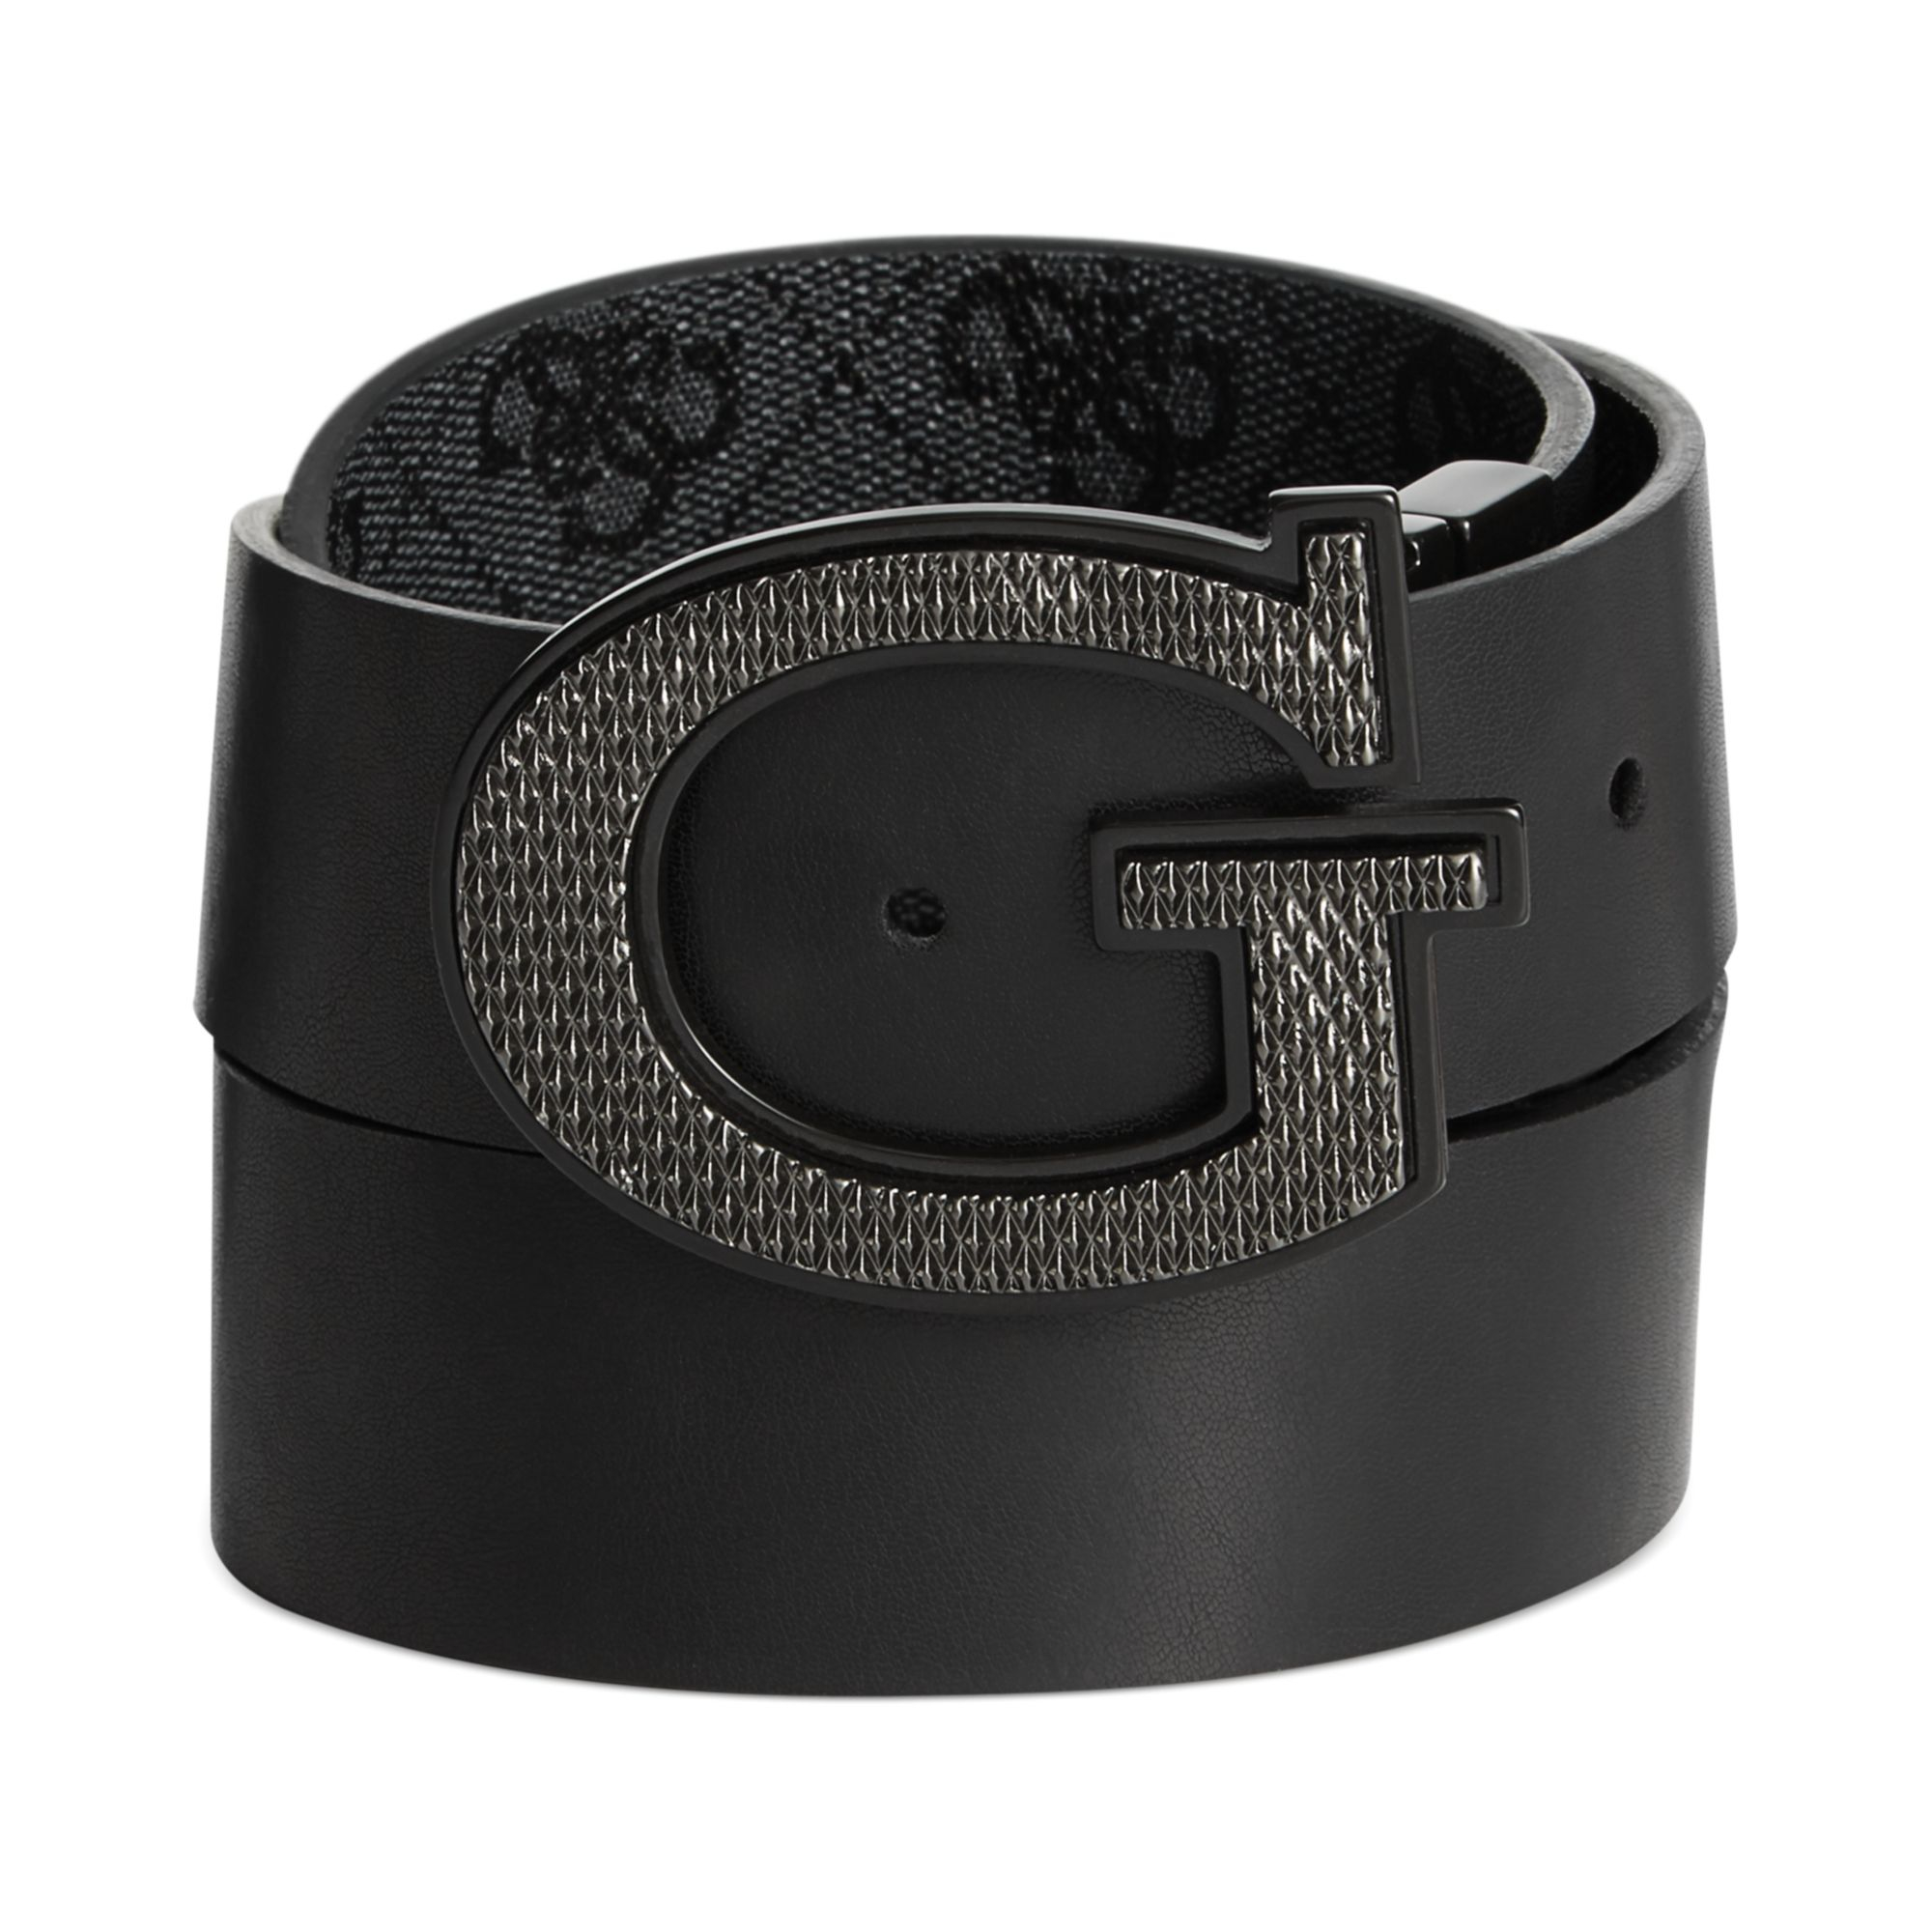 e970f52f850 Guess Black 35mm Reversible Leather Logo Buckle Belt for men